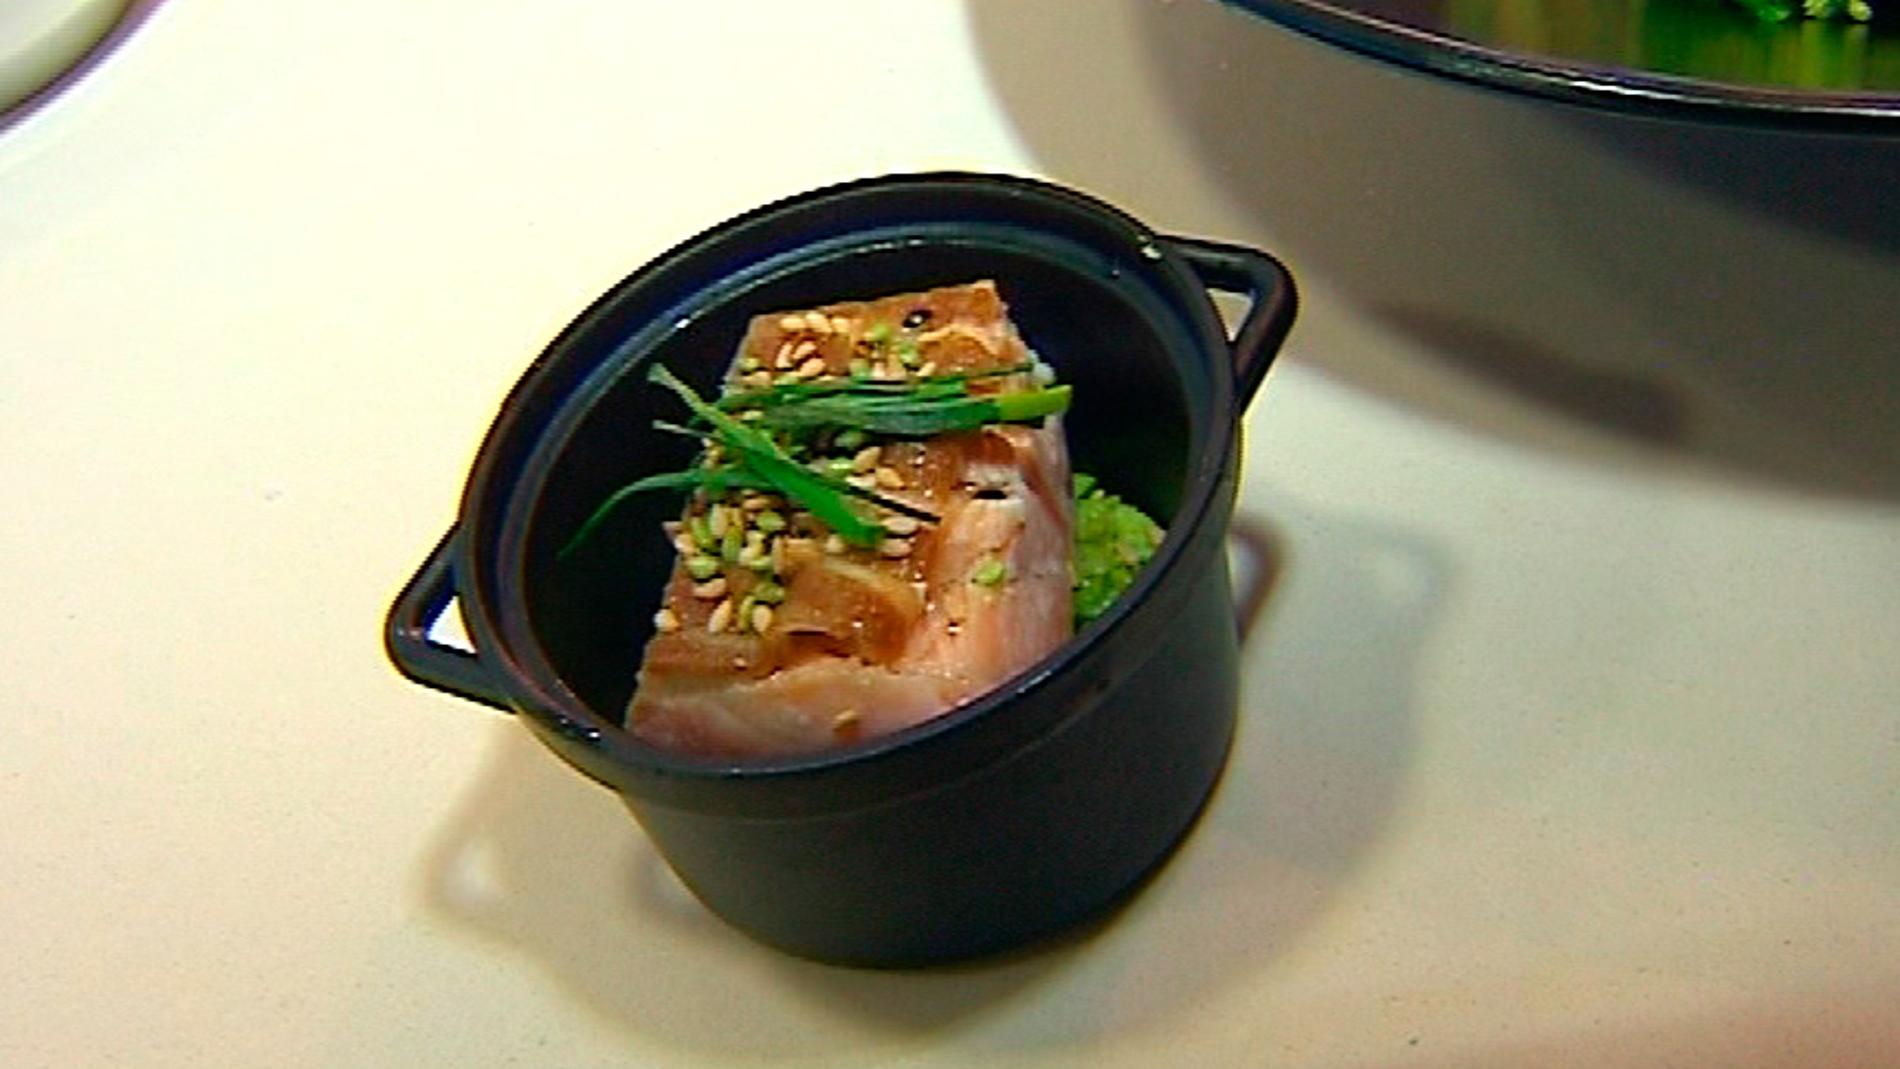 El salmón de Bárbara Amorós